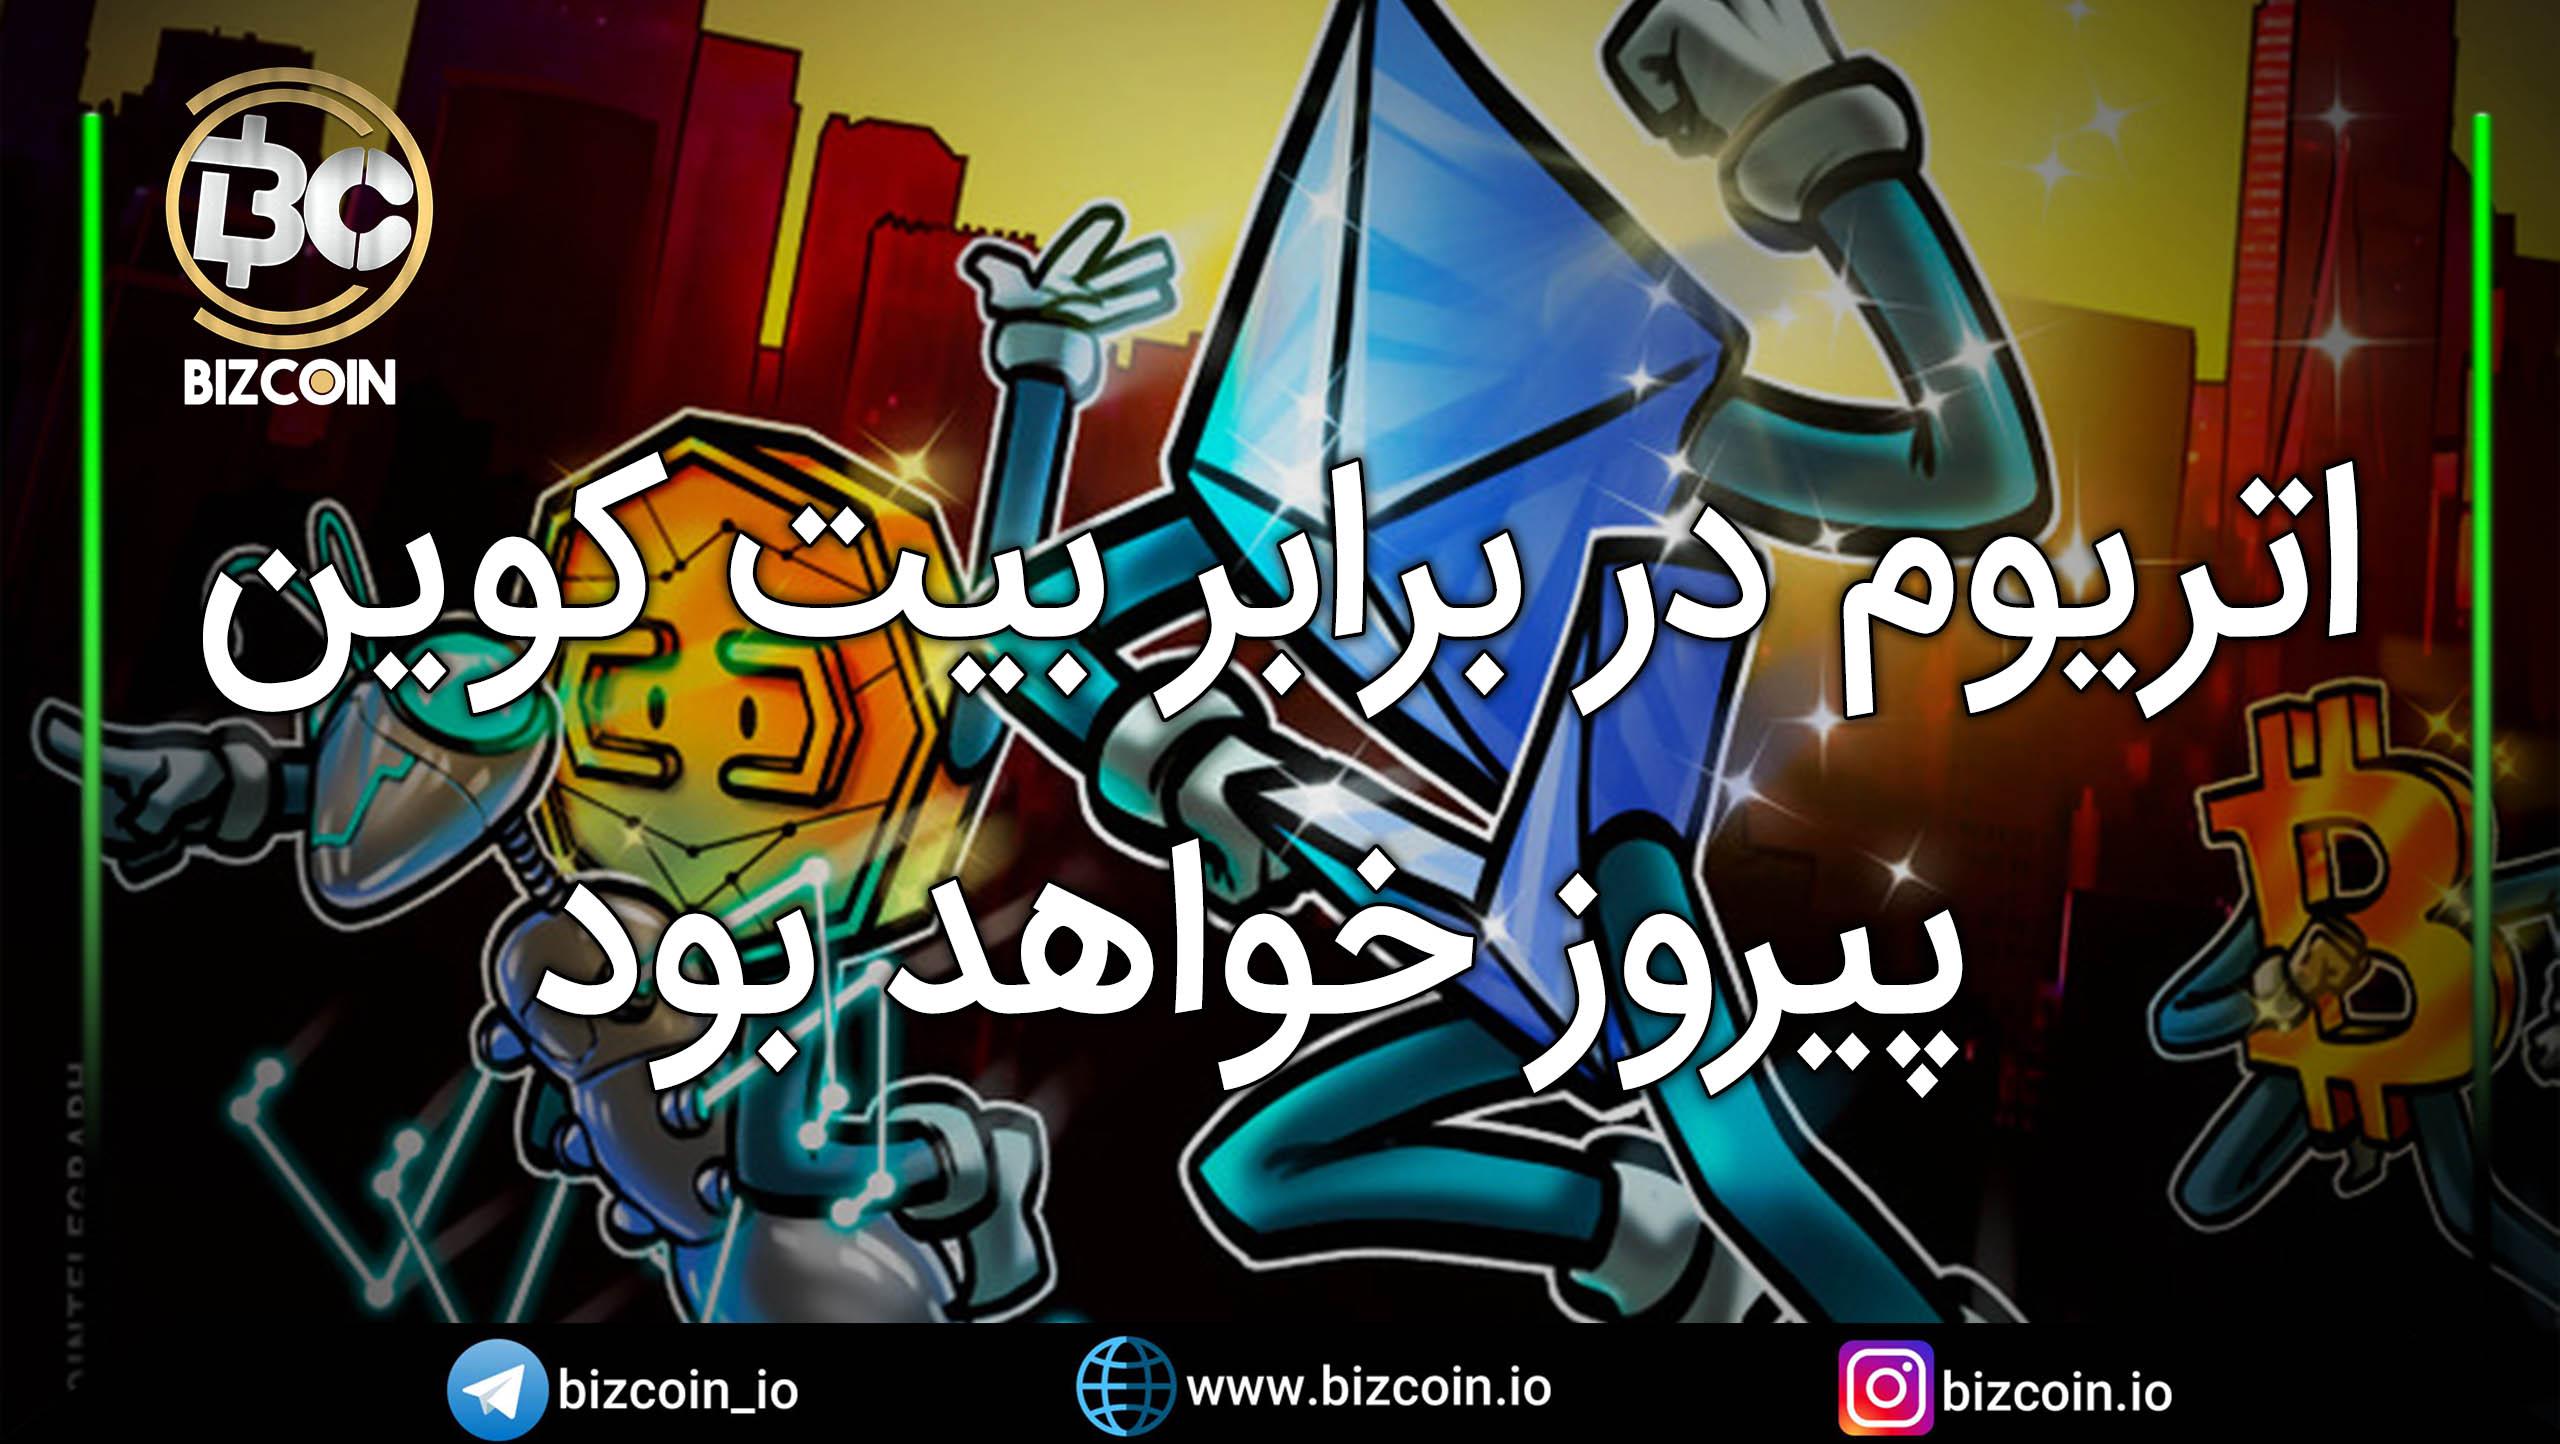 ethereum will win against Bitcoin اتریوم در برابر بیت کوین پیروز خواهد بود